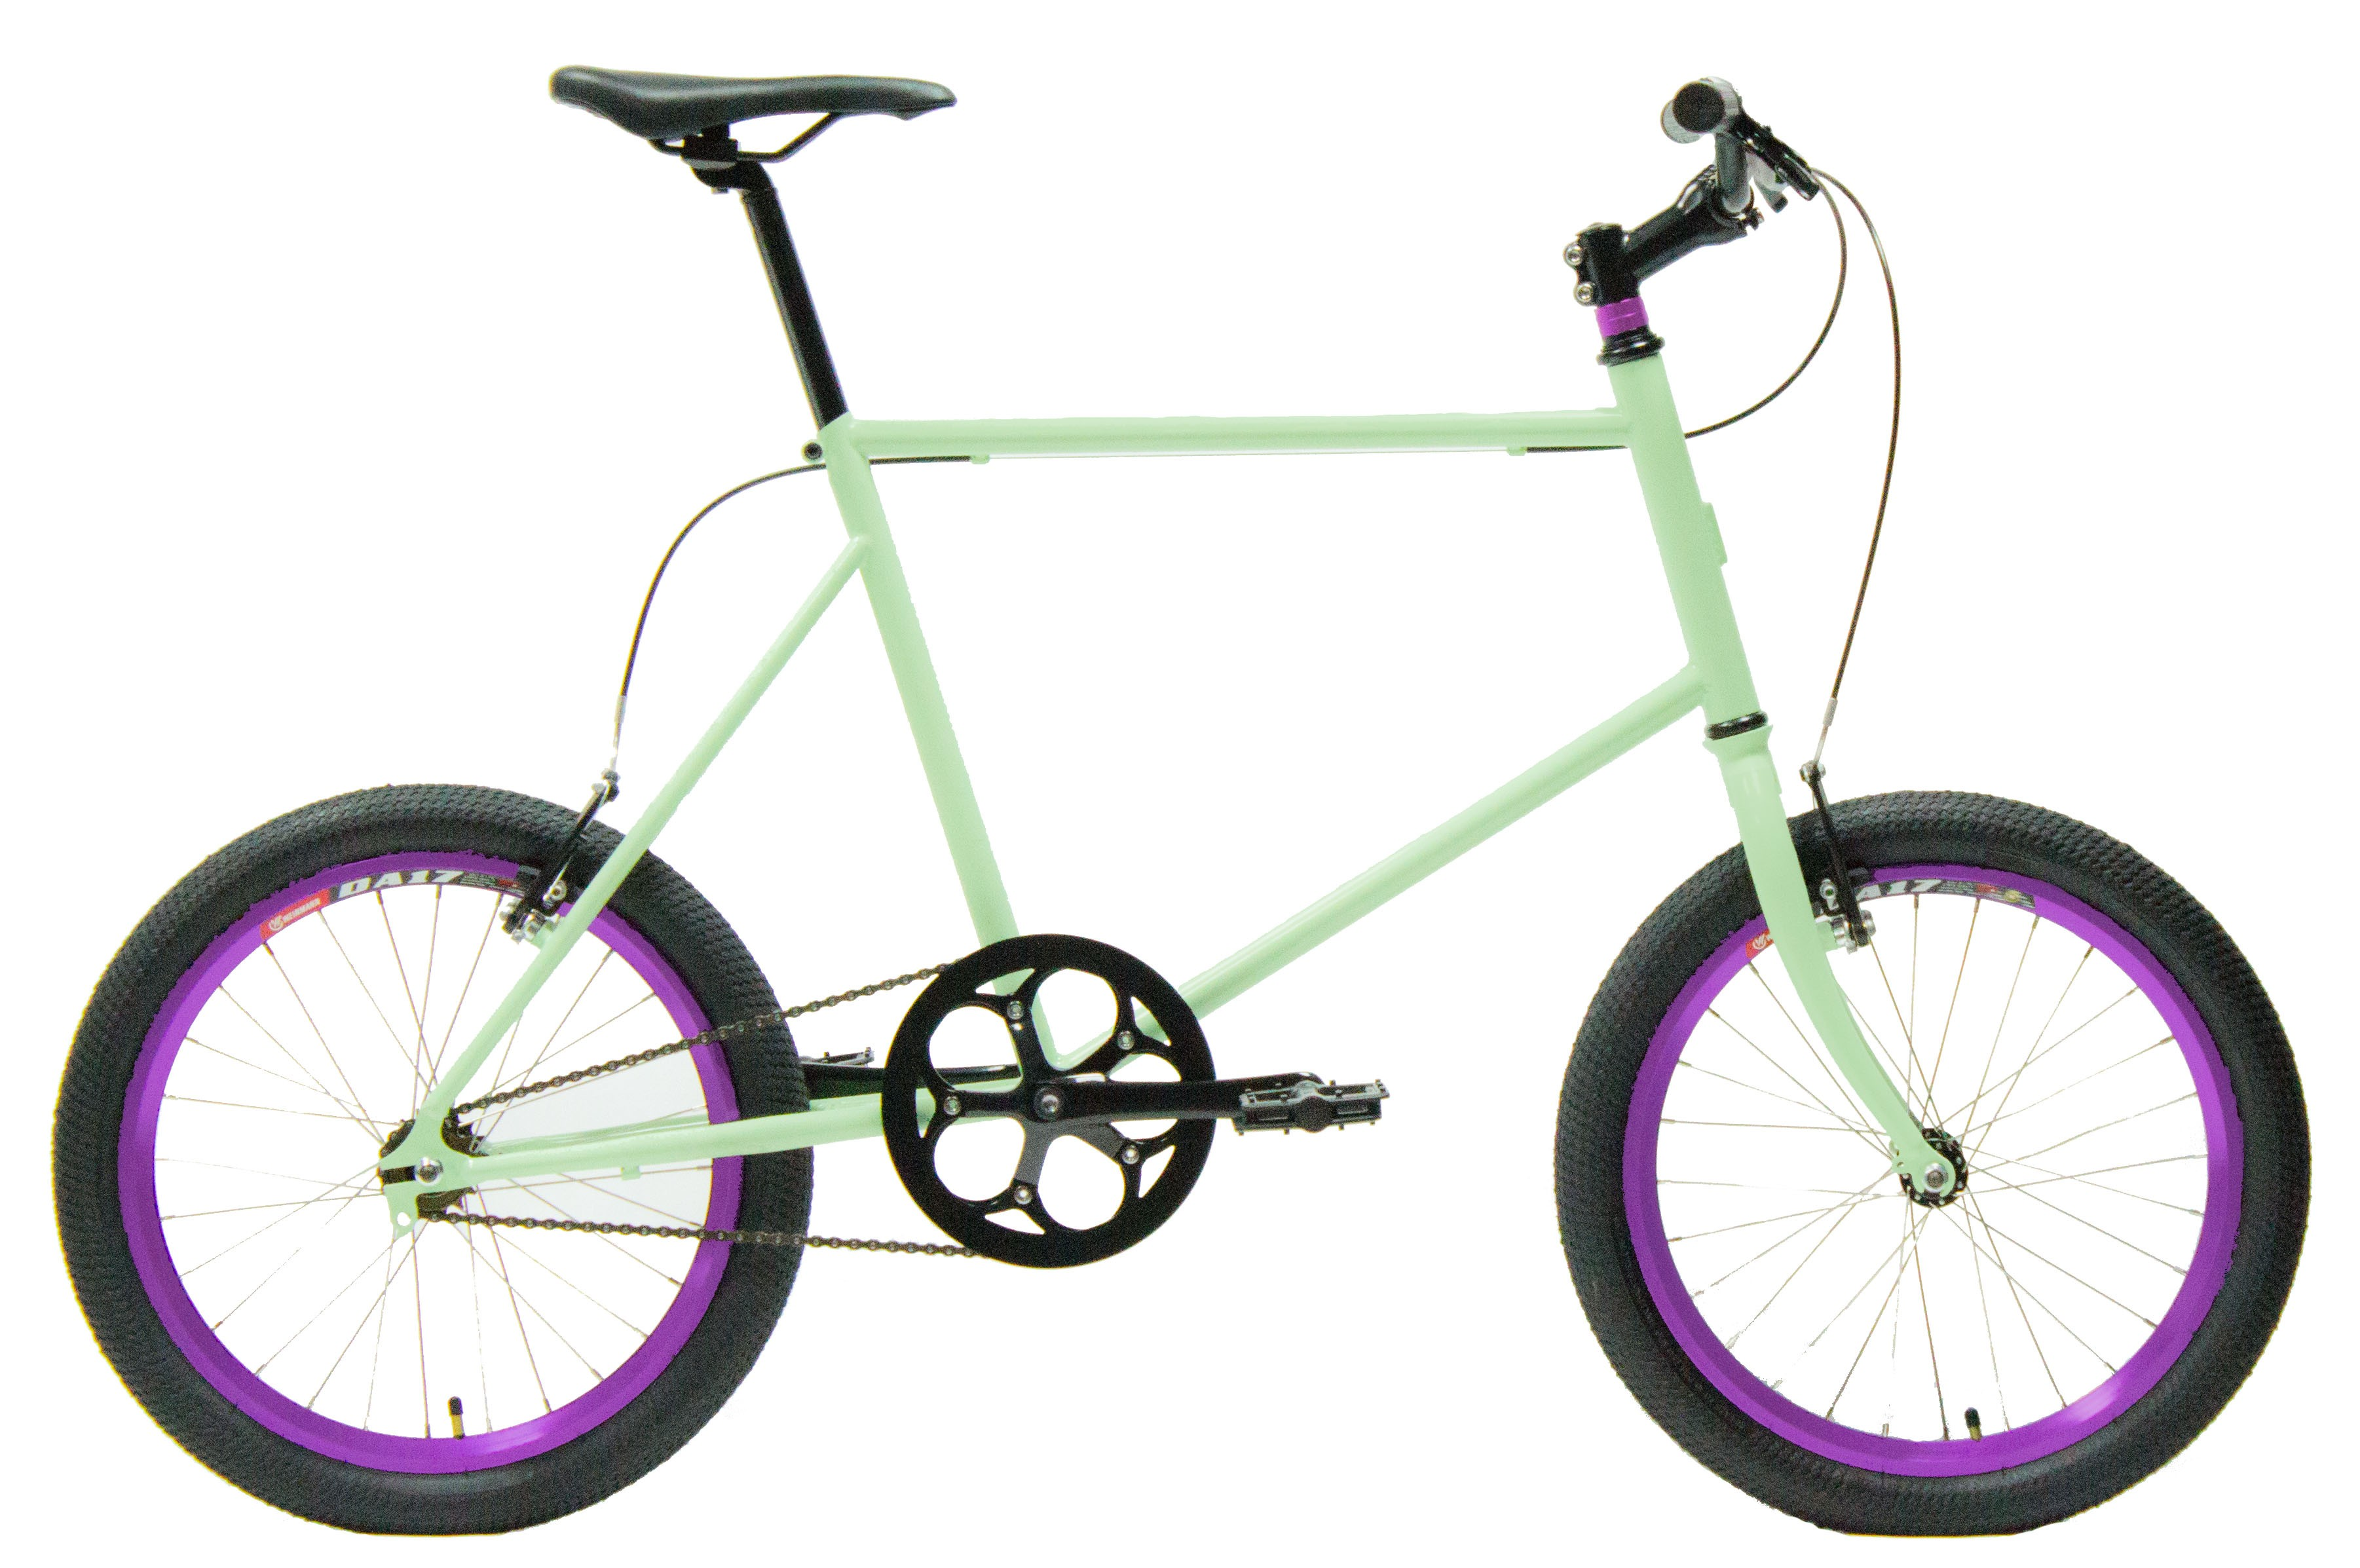 Bicicleta saint velo color salmón 1 velocidad